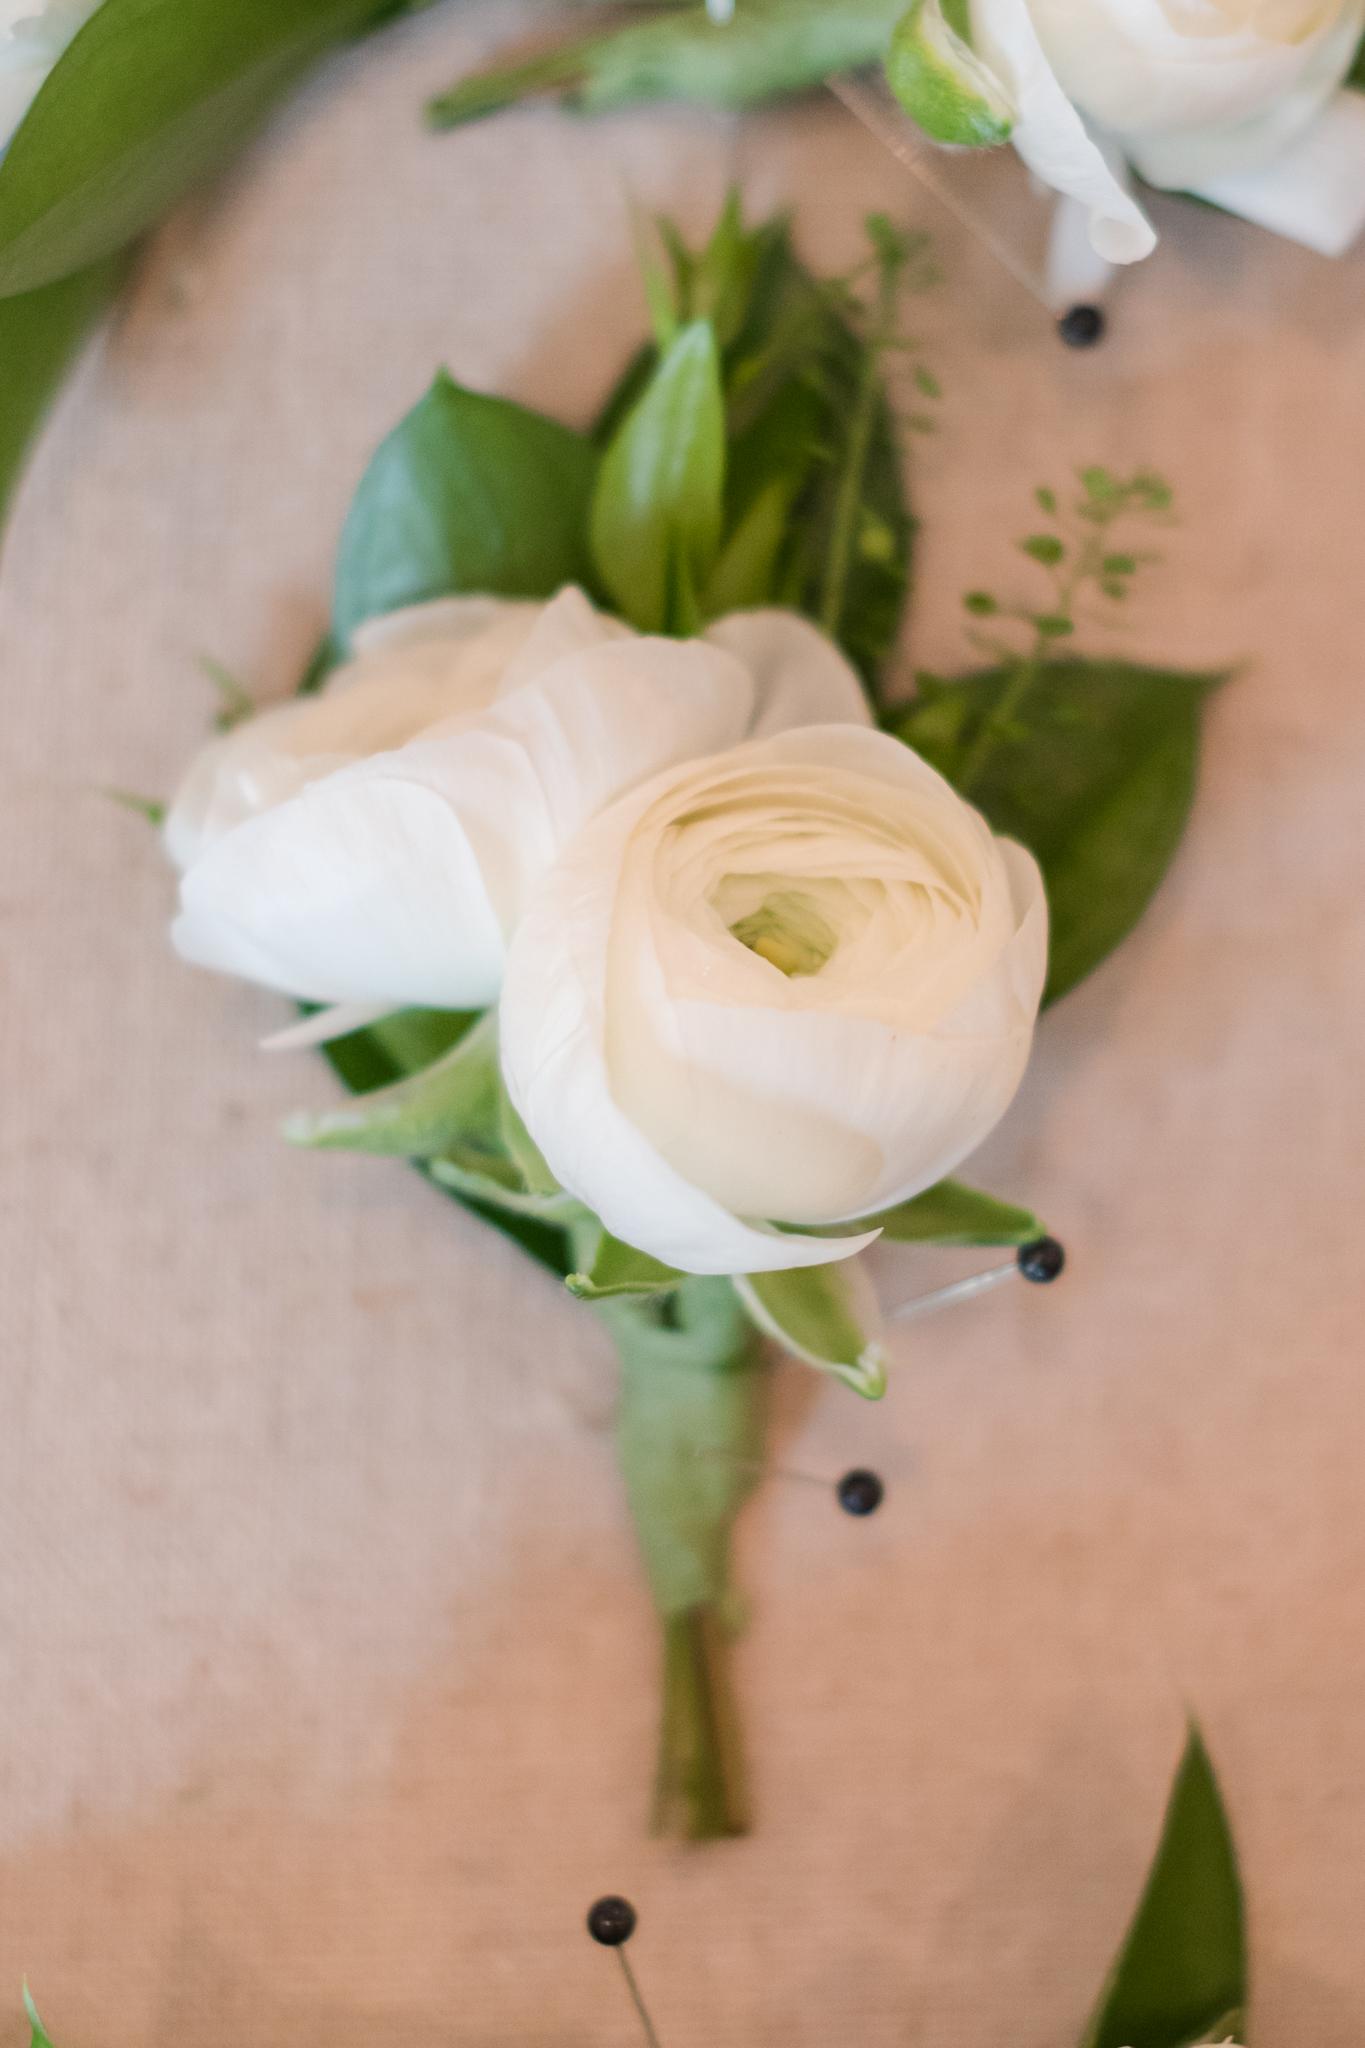 Black Iris Estate Wedding Elegant White with Greenery Luxury High End Flowers-2.jpg